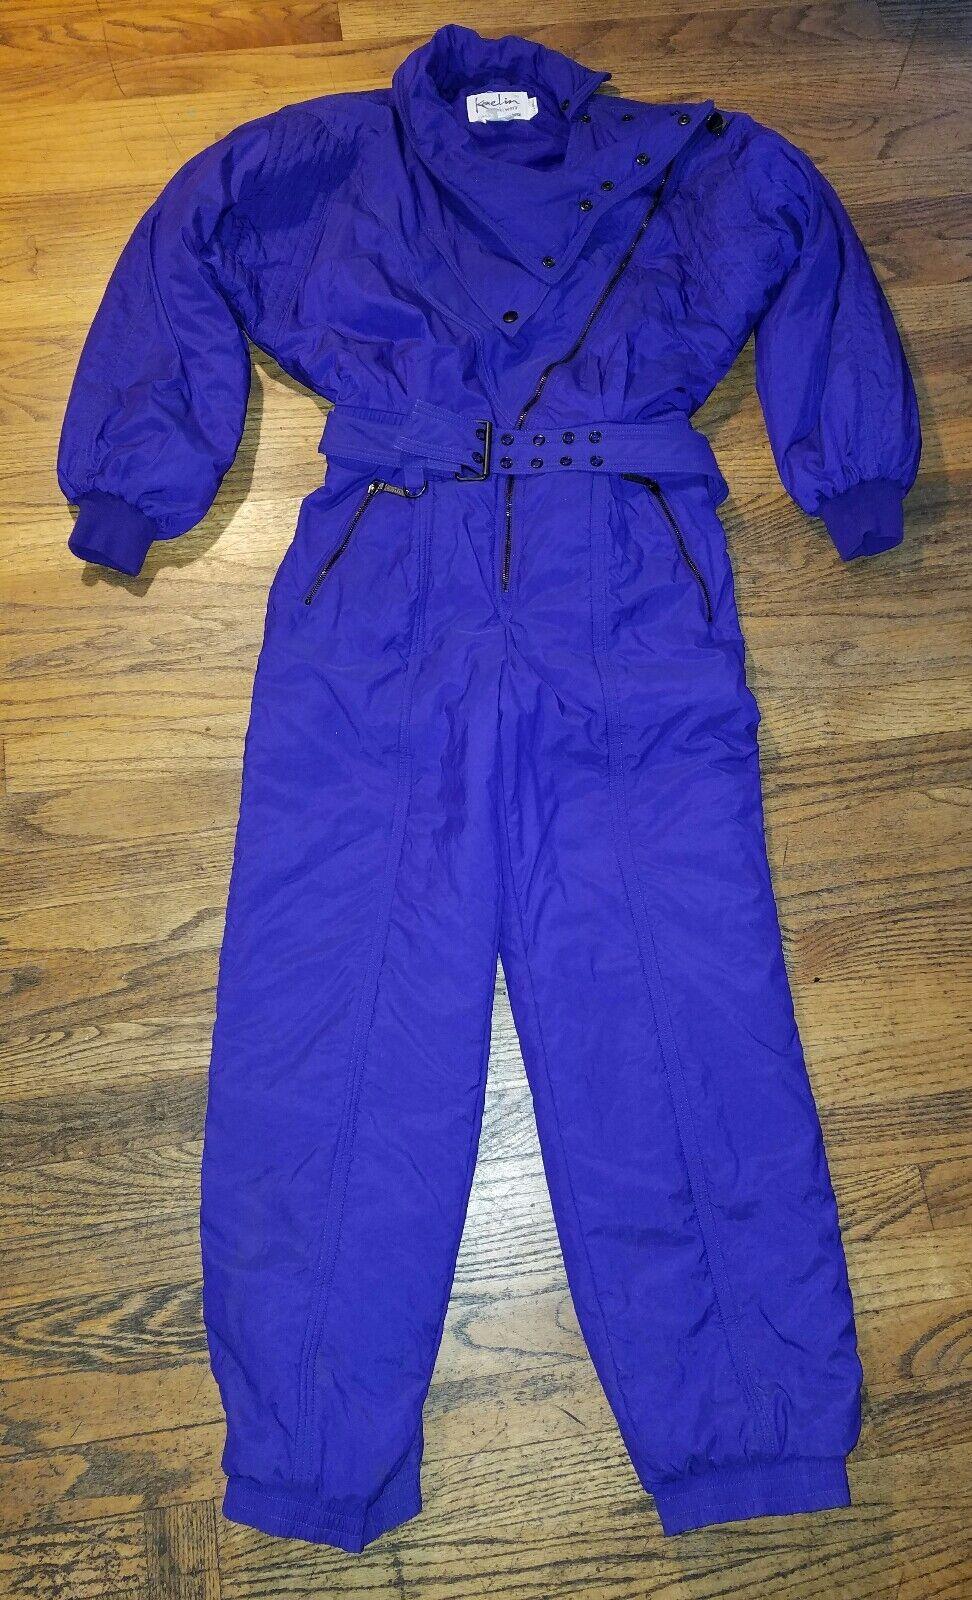 NICE Vintage KAELIN Ski Suit Purple Winter Snowboard 90s 80s CUTE 10 Ladies